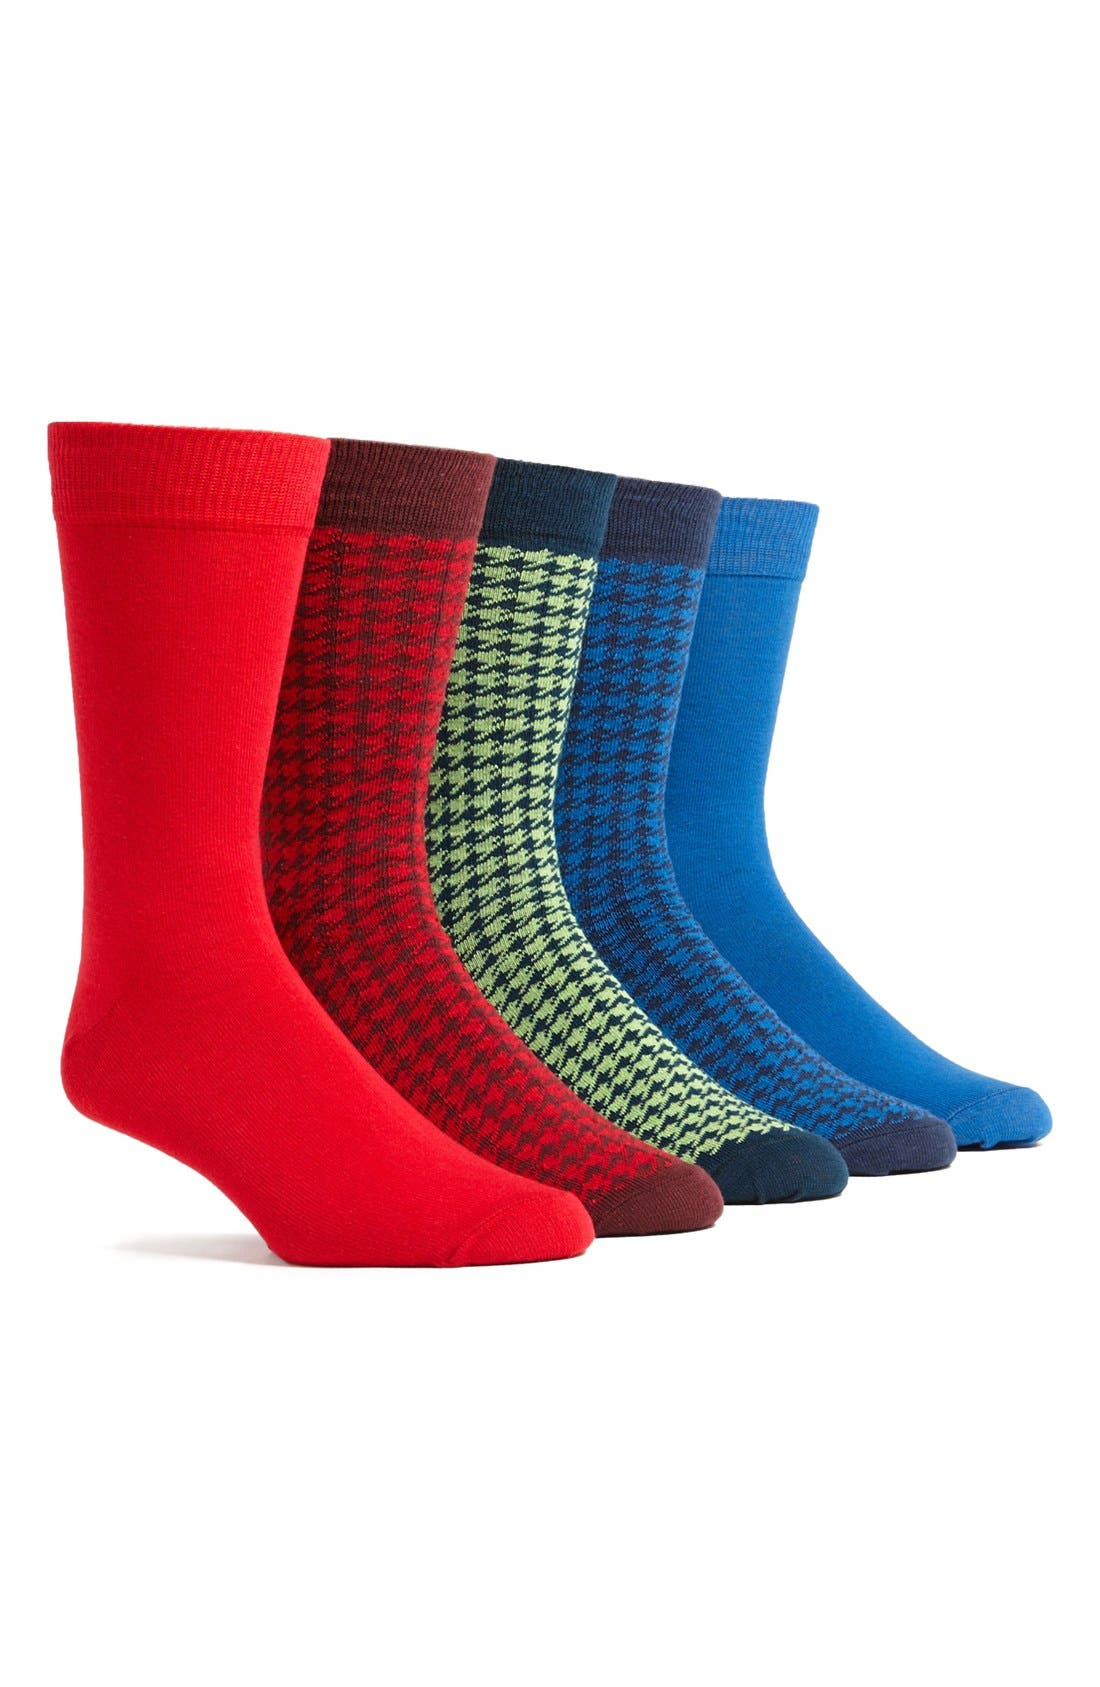 Main Image - Topman Houndstooth Pattern Socks (5-Pack)